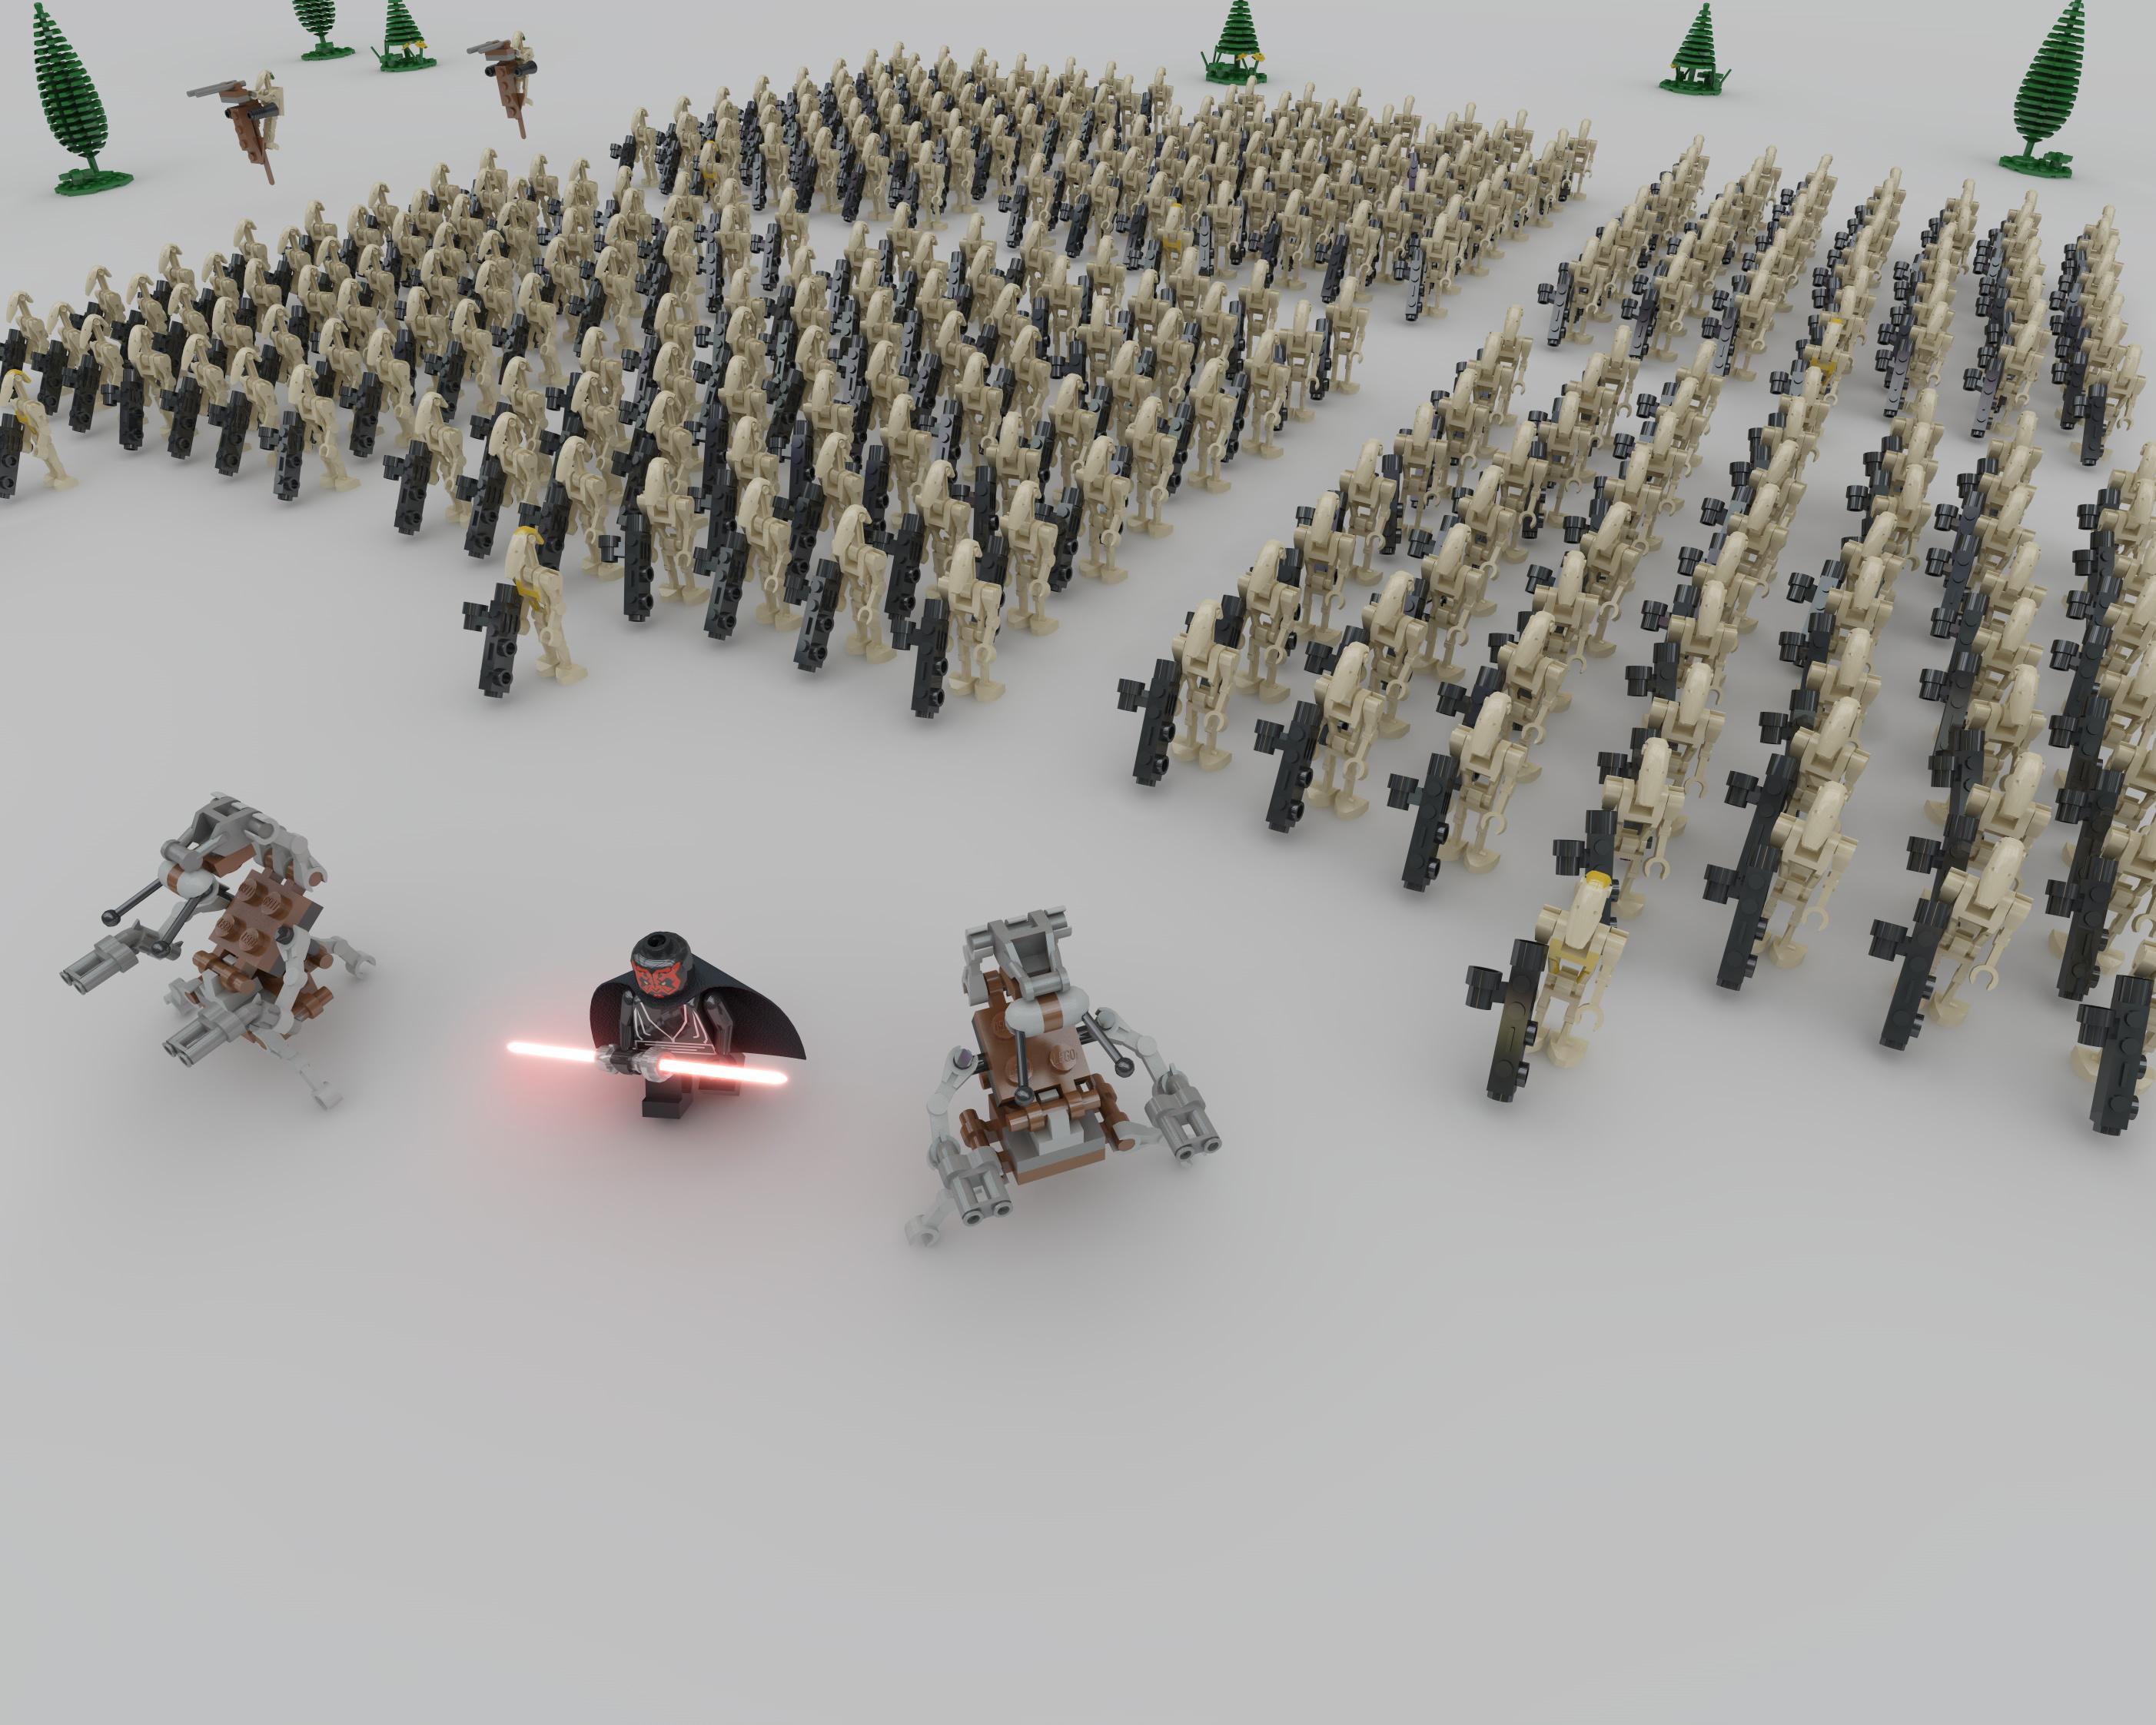 Lego battle droid army by ligh7bulb on deviantart - Lego star wars base droide ...